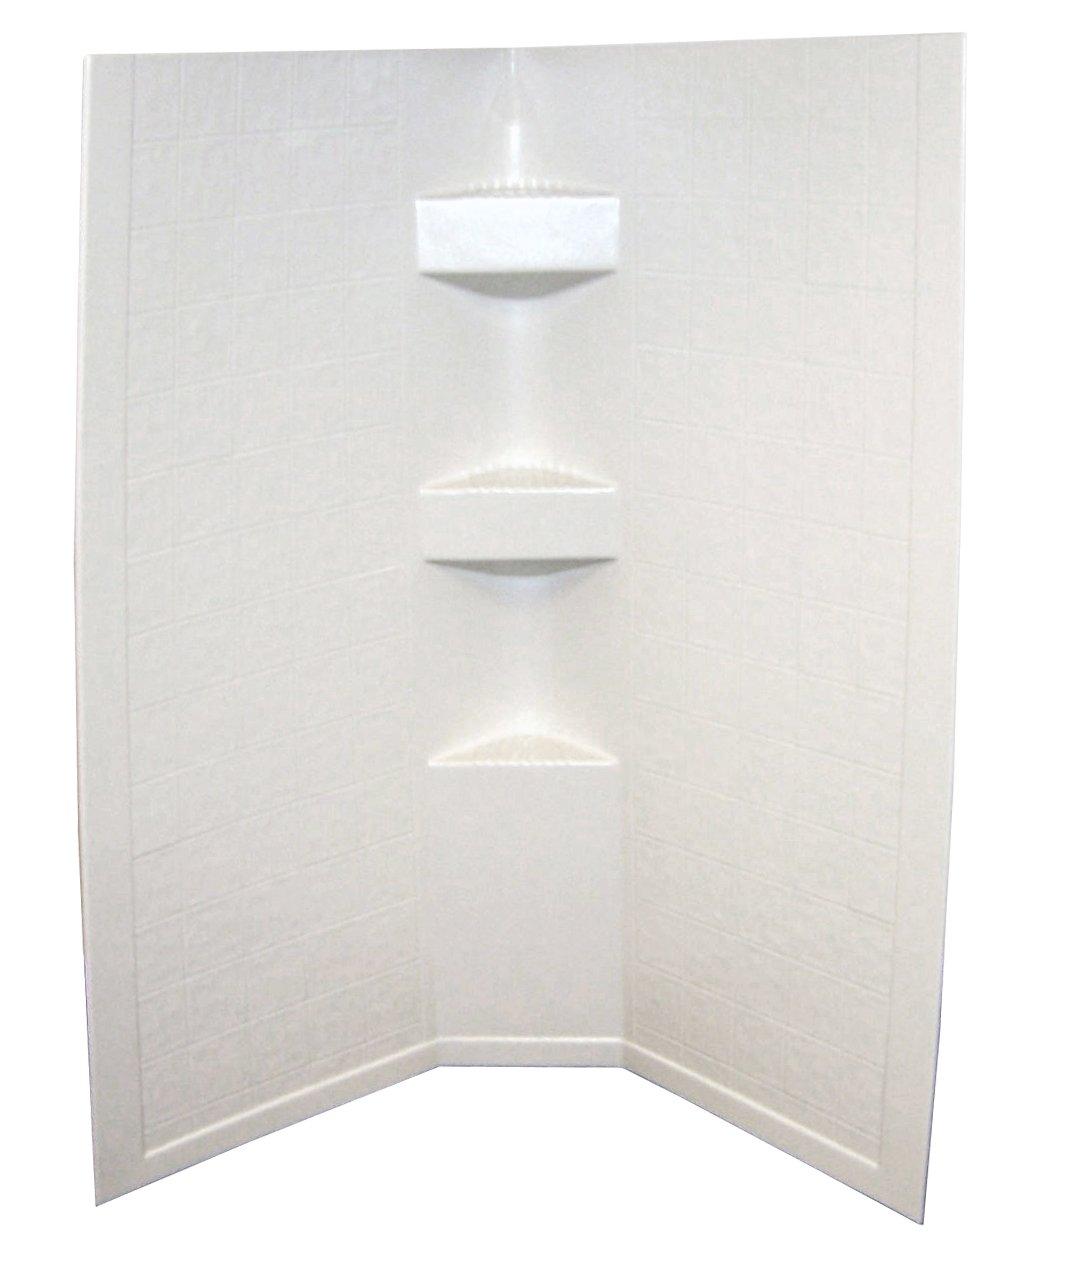 Lippert 306203 Better Bath 34'' x 34'' x 68'' Neo Angle RV Shower Surround Parchment Slate